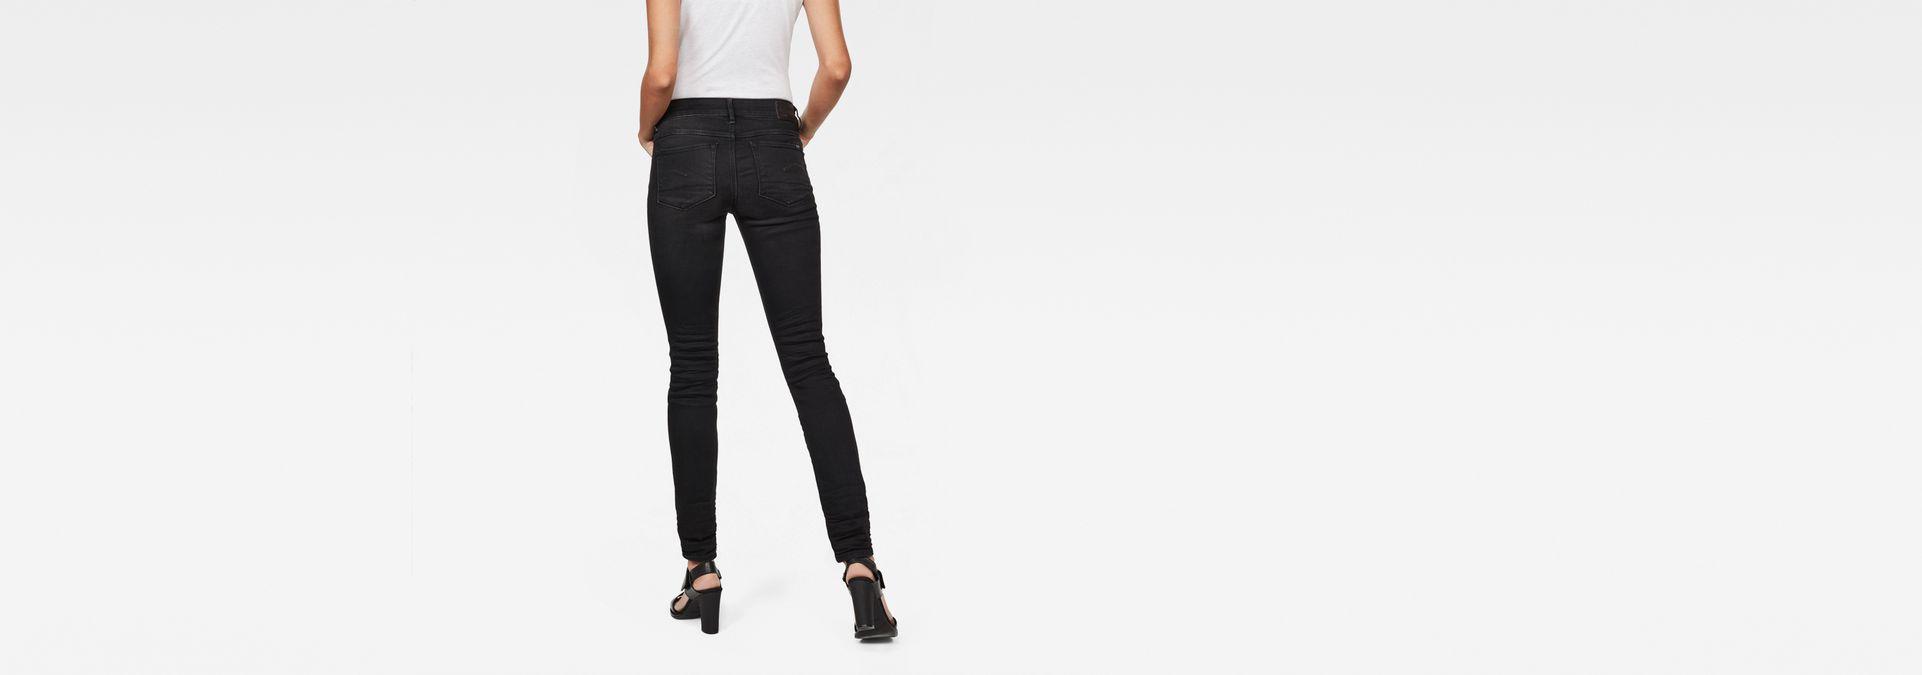 3301 Contour Straight Jeans   Medium Aged   Women   G Star RAW®